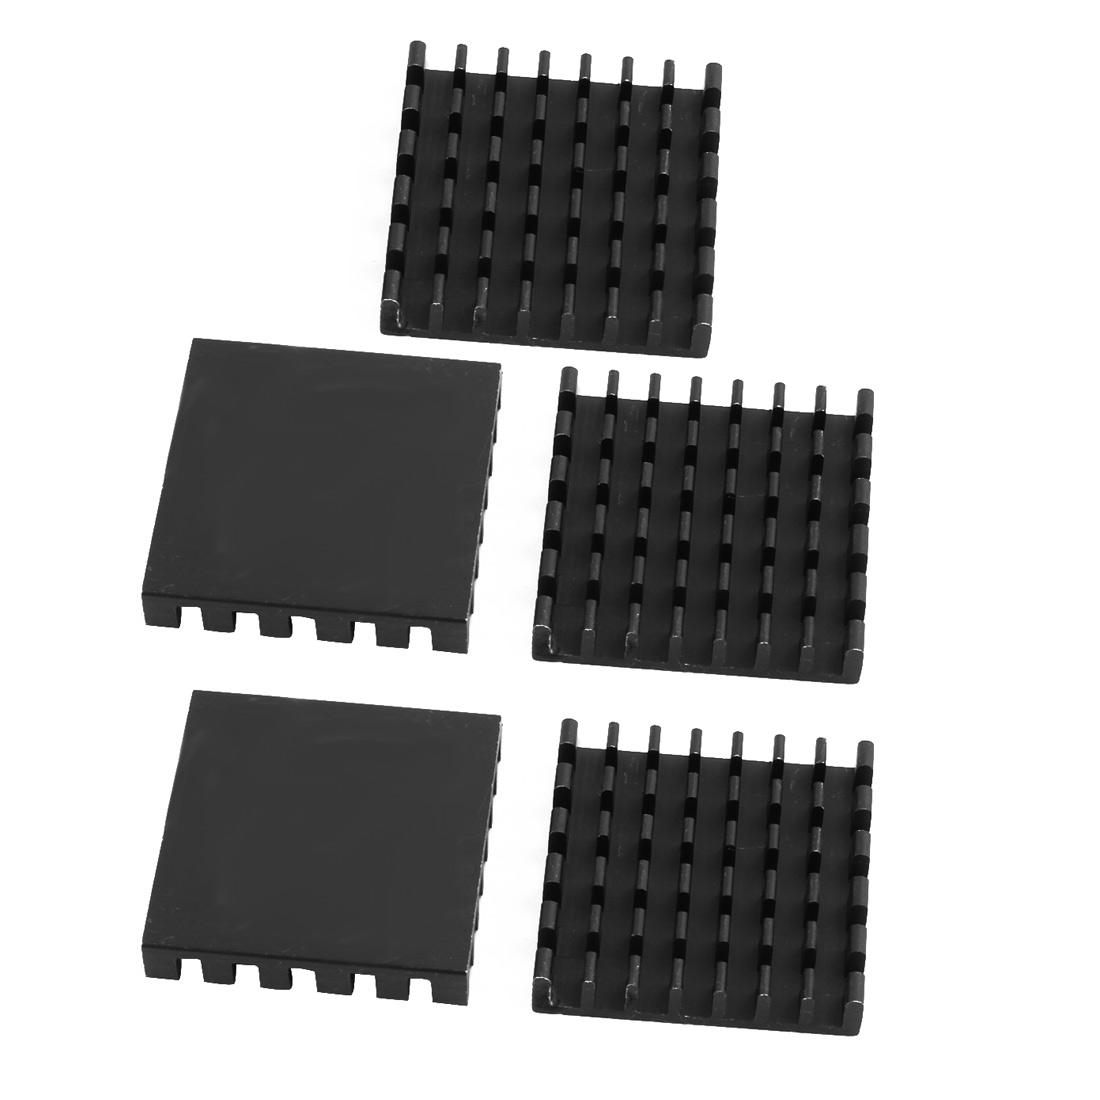 5Pcs 25mm x 25mm x 5mm Aluminum Heatsink Heat Diffuse Cooling Fin Black